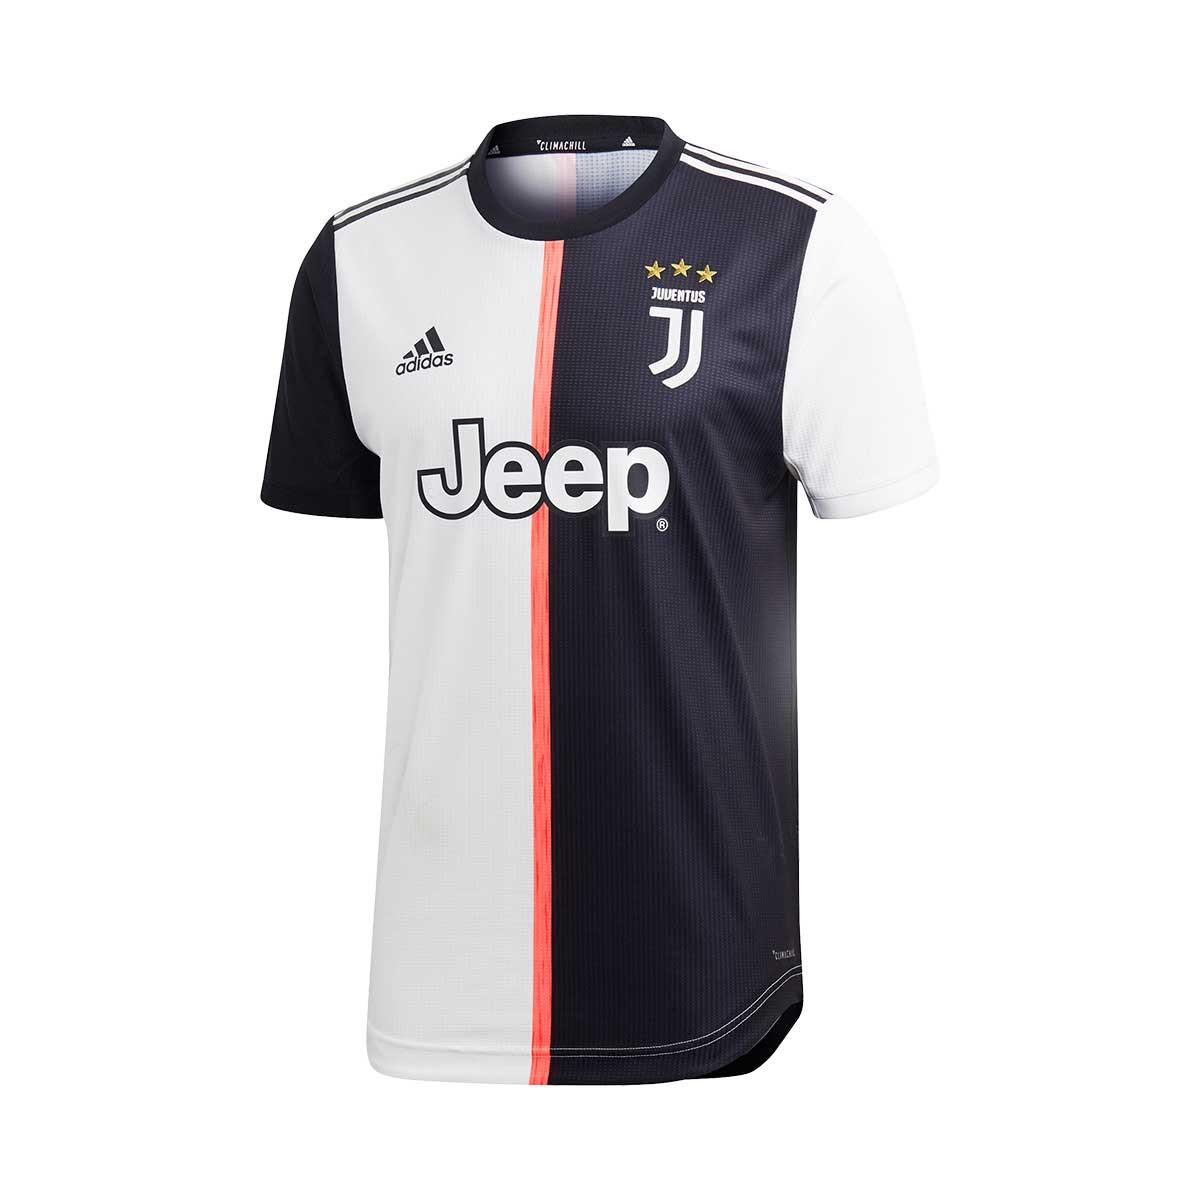 promo code c86e2 25b1e Camiseta Juventus Authentic Primera Equipación 2019-2020 Black-White